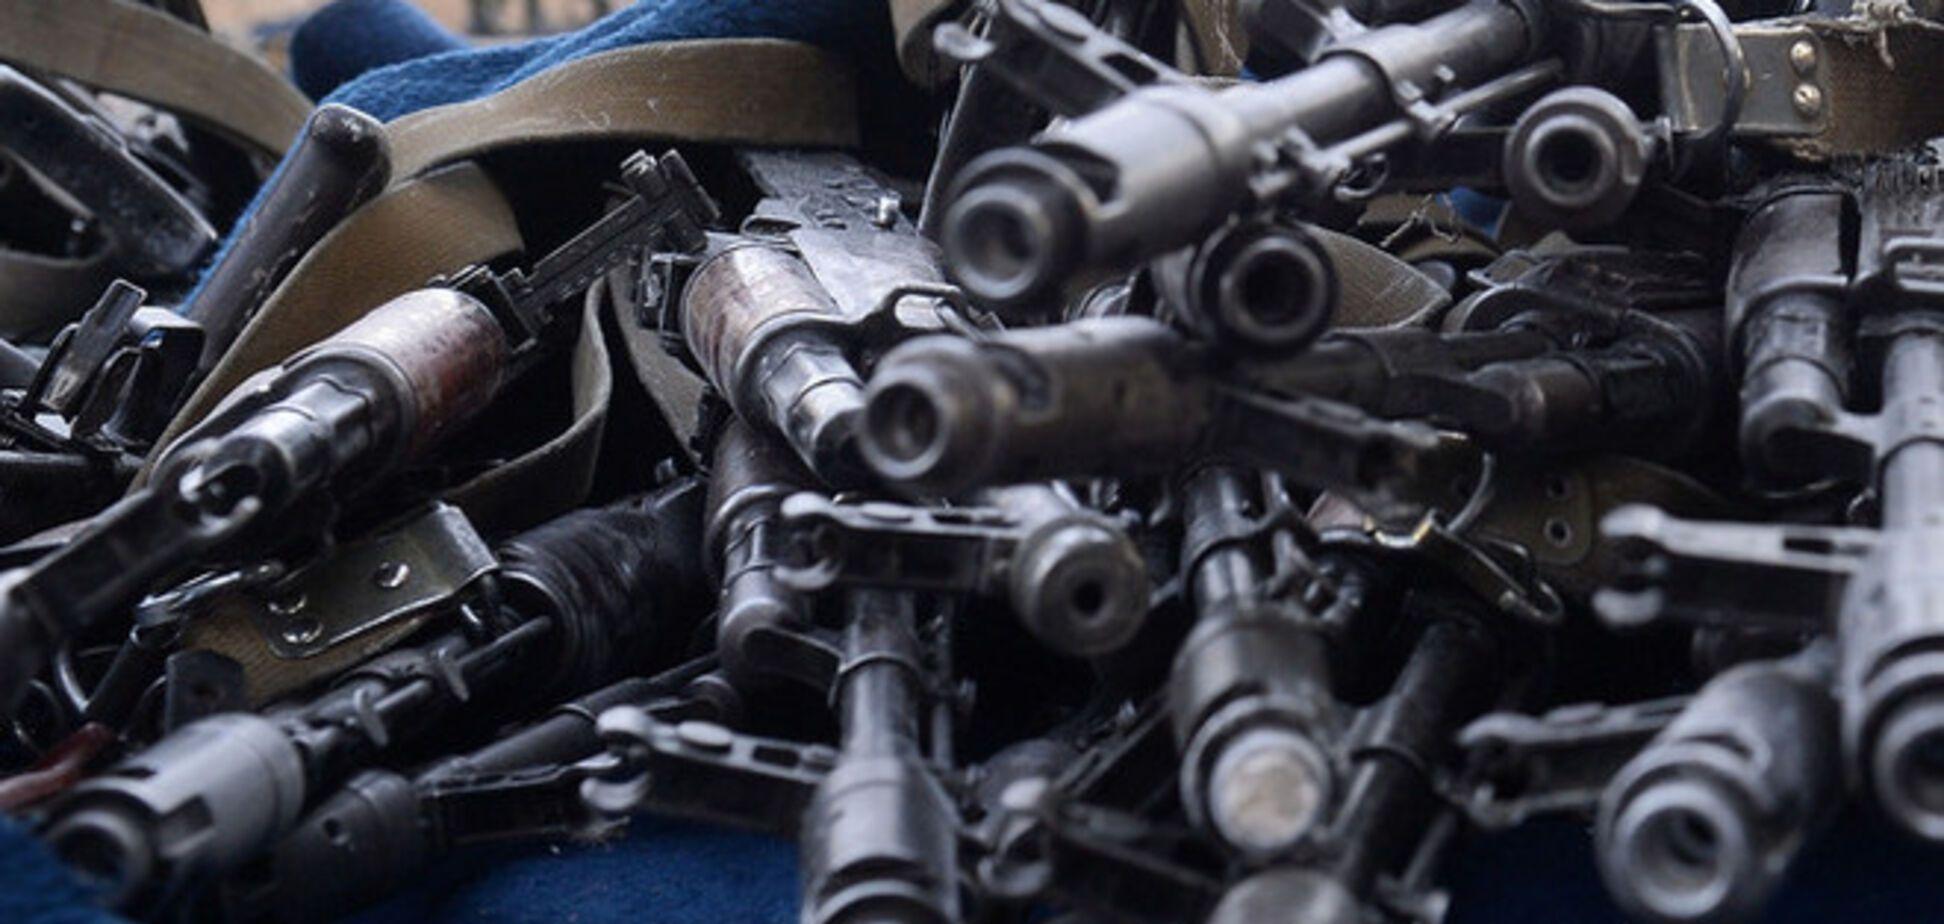 Милицейский спецбат 'Ивано-Франковск' в боях потерял 70 единиц оружия